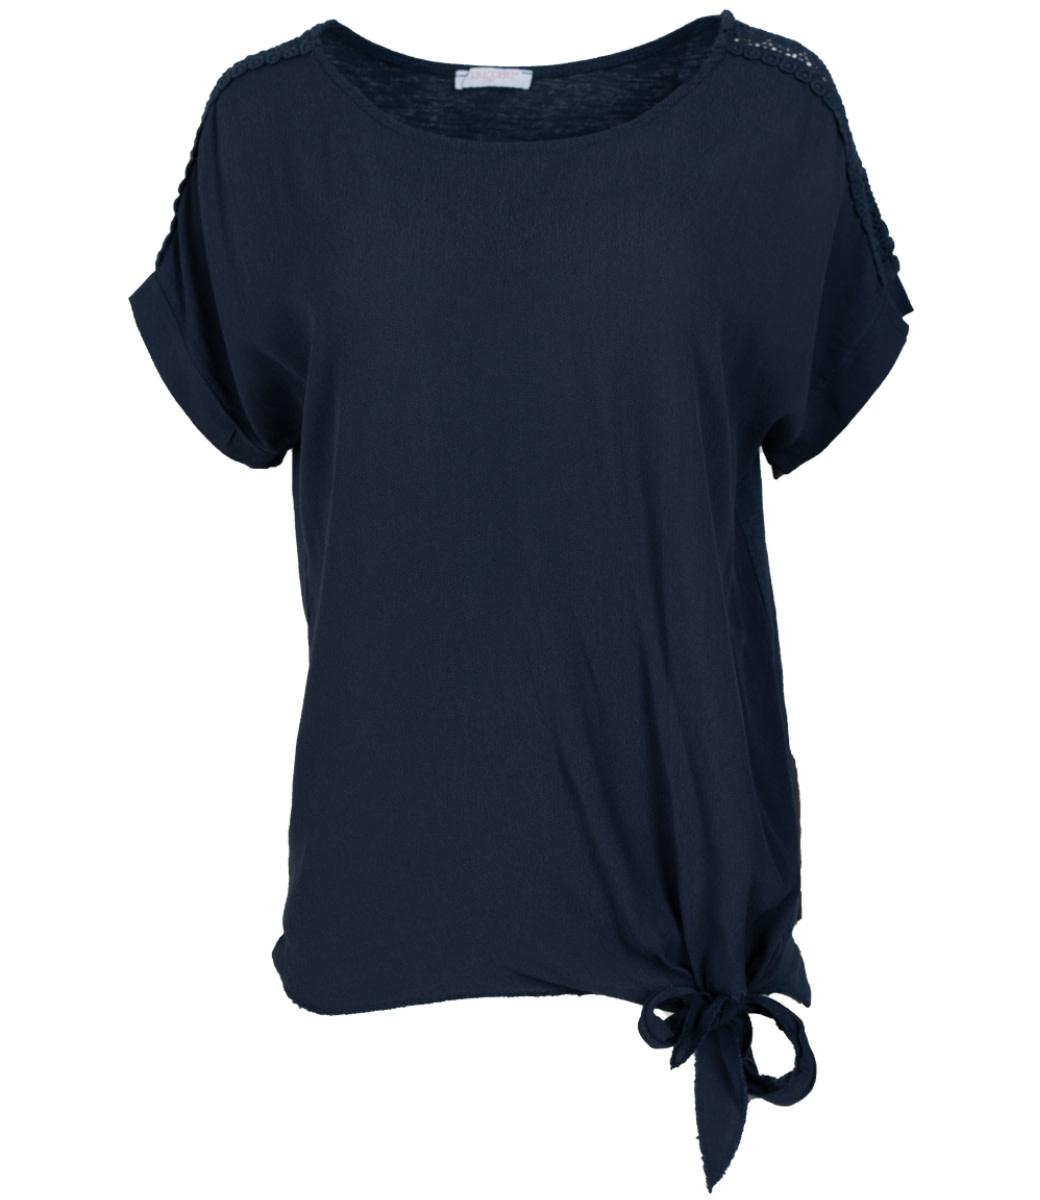 Gemma Ricceri Shirt donkerblauw Madelief